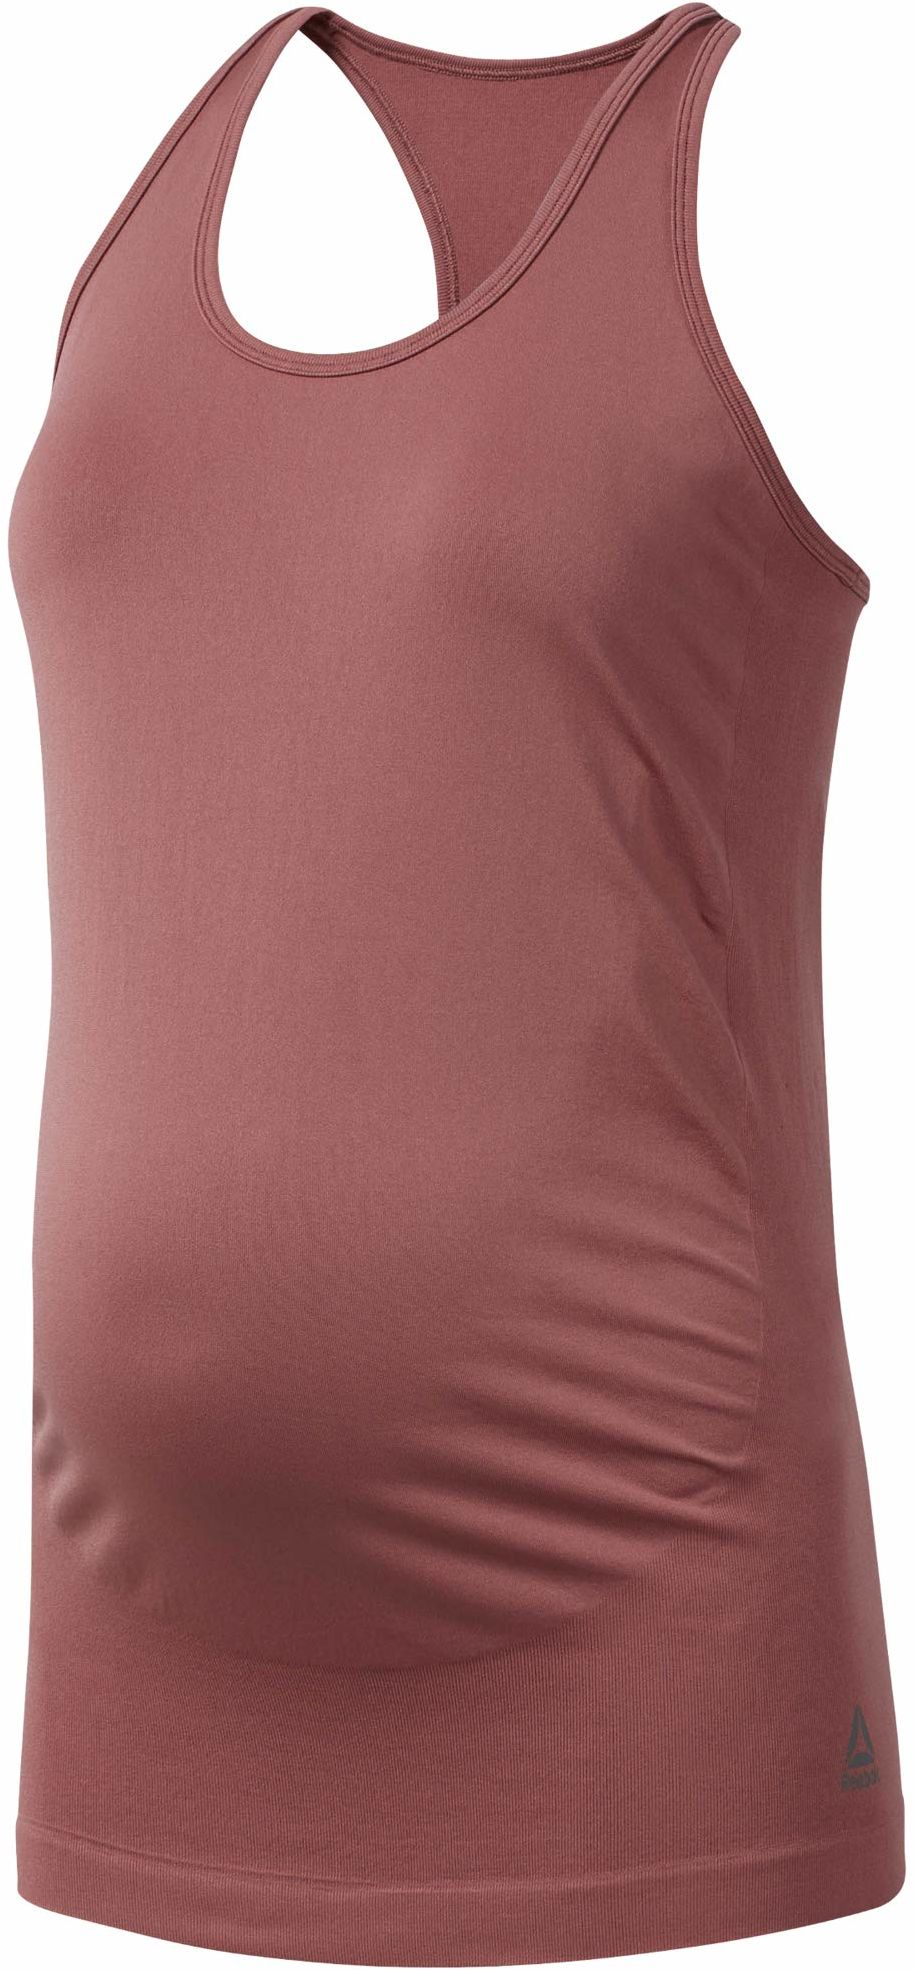 Reebok Y Seamless Maternity Tank koszulka damska bez rękawów, różowa (Rose Dust), XS